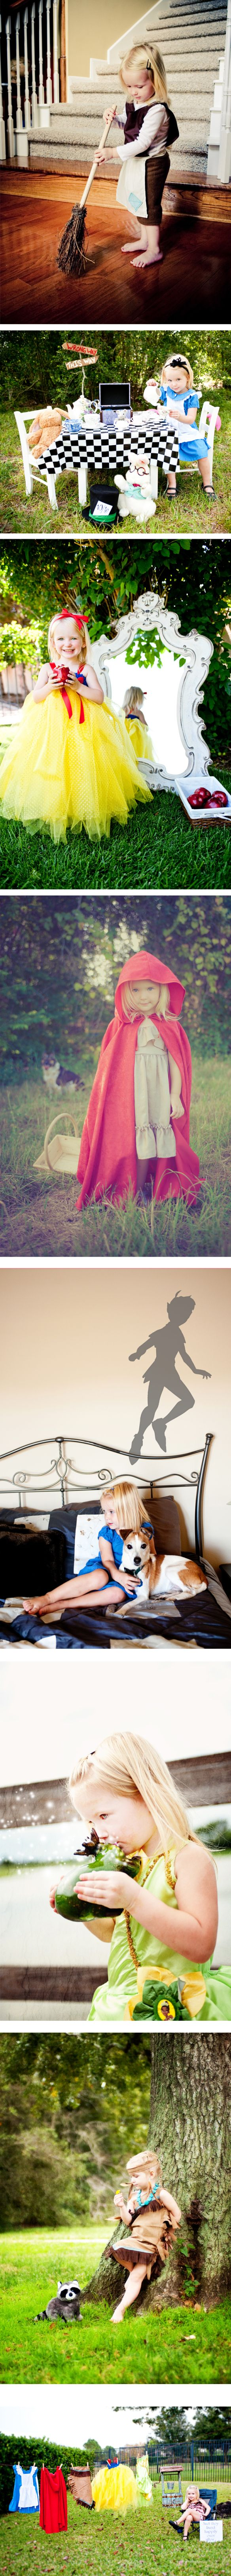 Fairy Tale Recap |